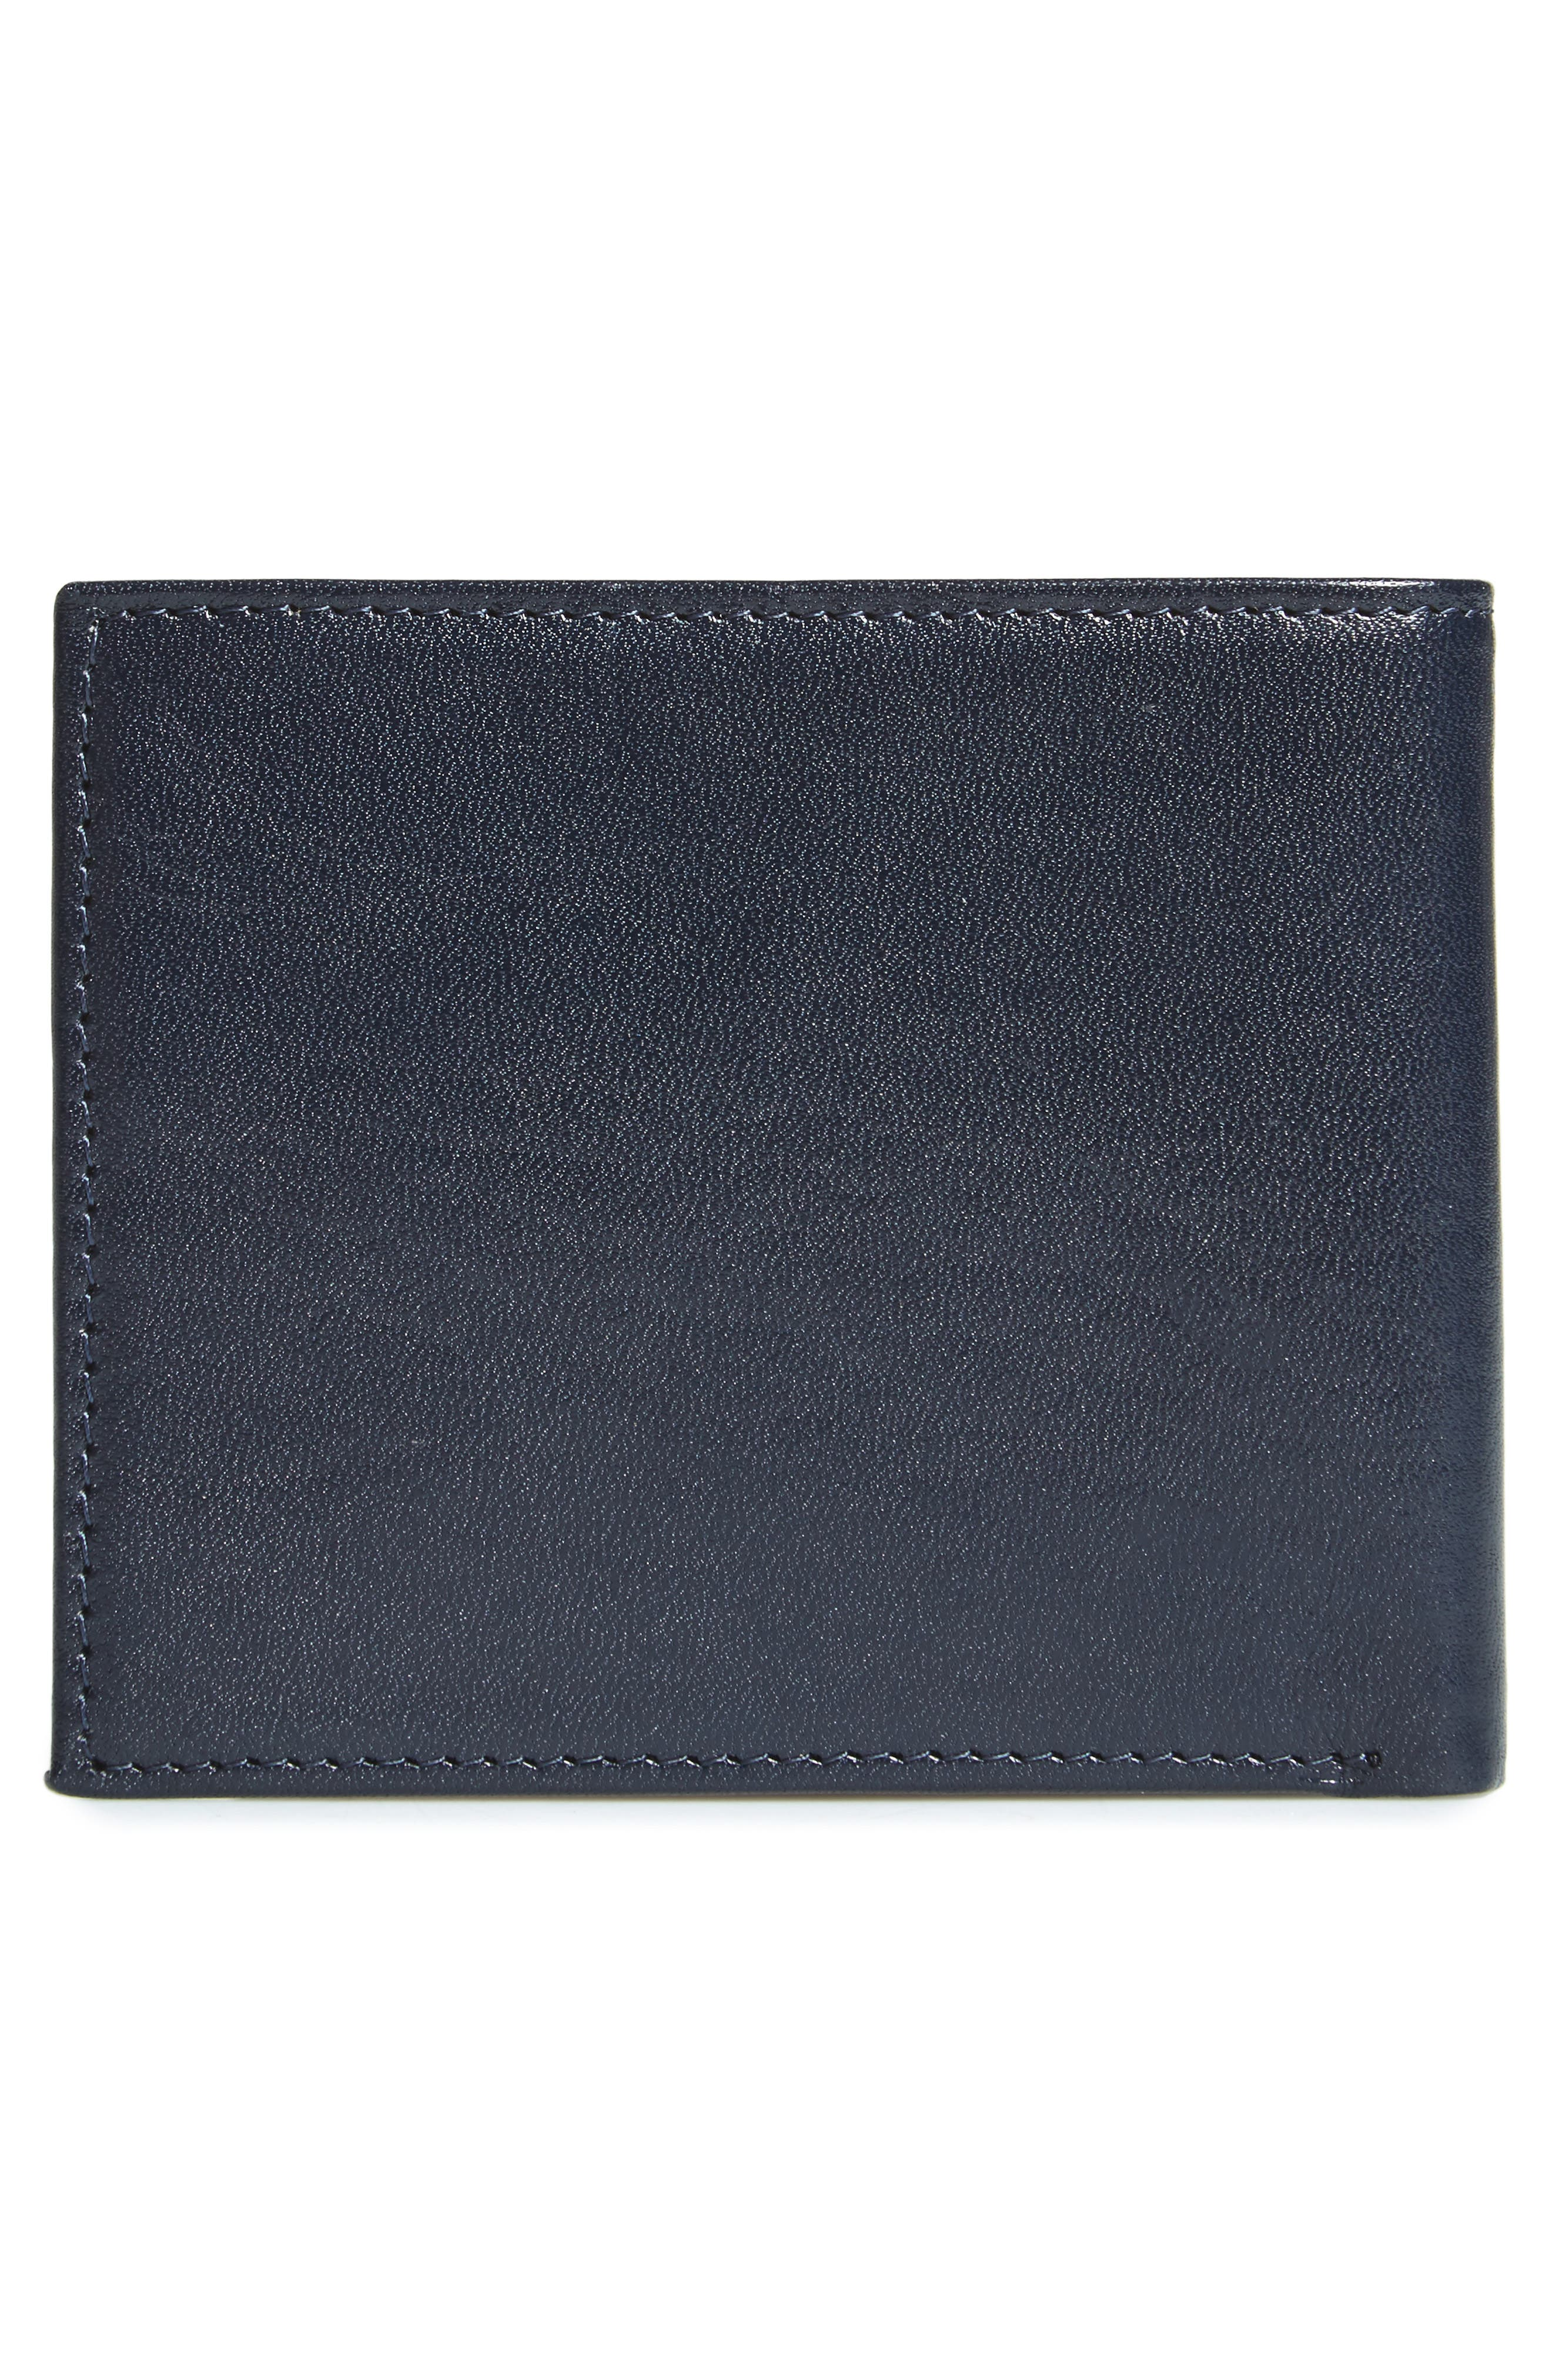 Vivid Leather Wallet,                             Alternate thumbnail 6, color,